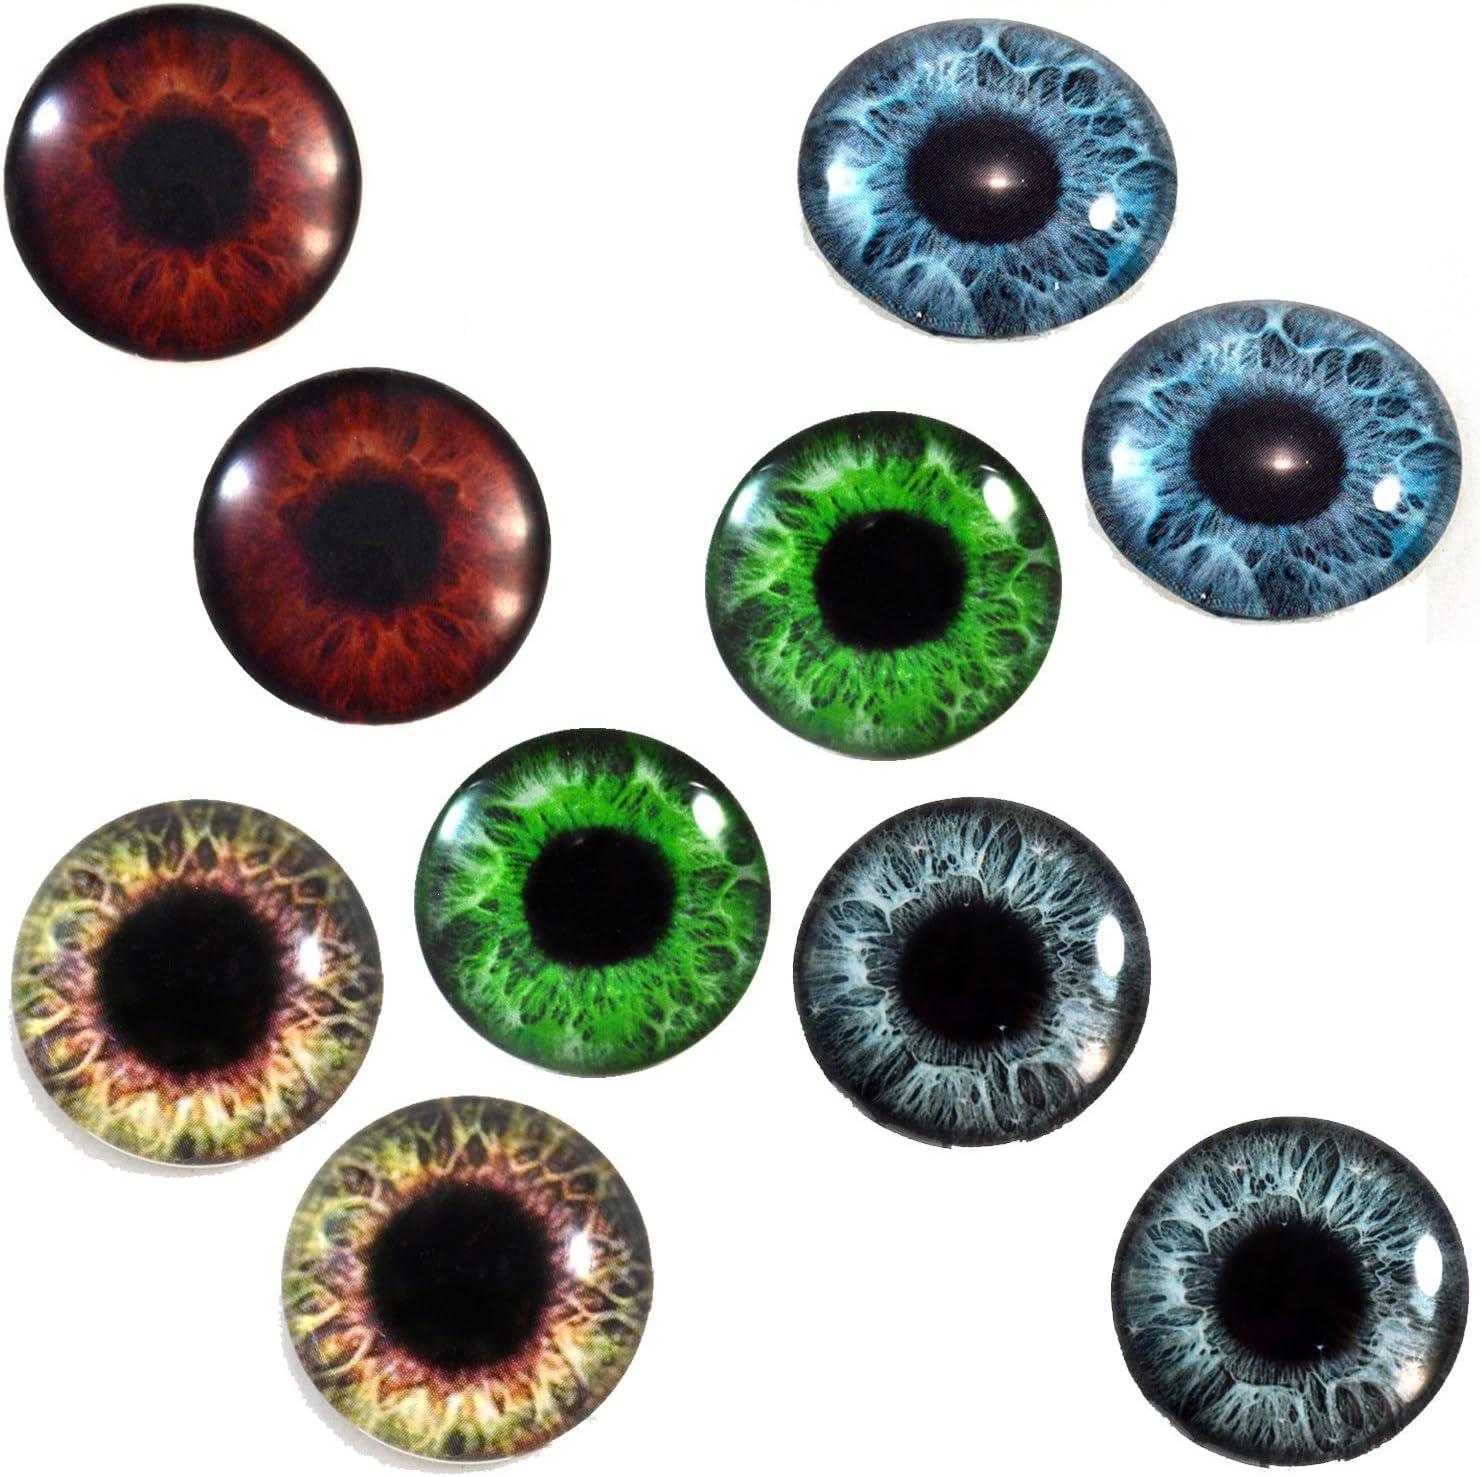 Human Doll Eyeballs Handmade Glass Cabochons Blood Shot Design 18 8mm 10mm 12mm 13mm 14mm 16mm 18mm 20mm 25mm 30mm Zombie Glass Eyes